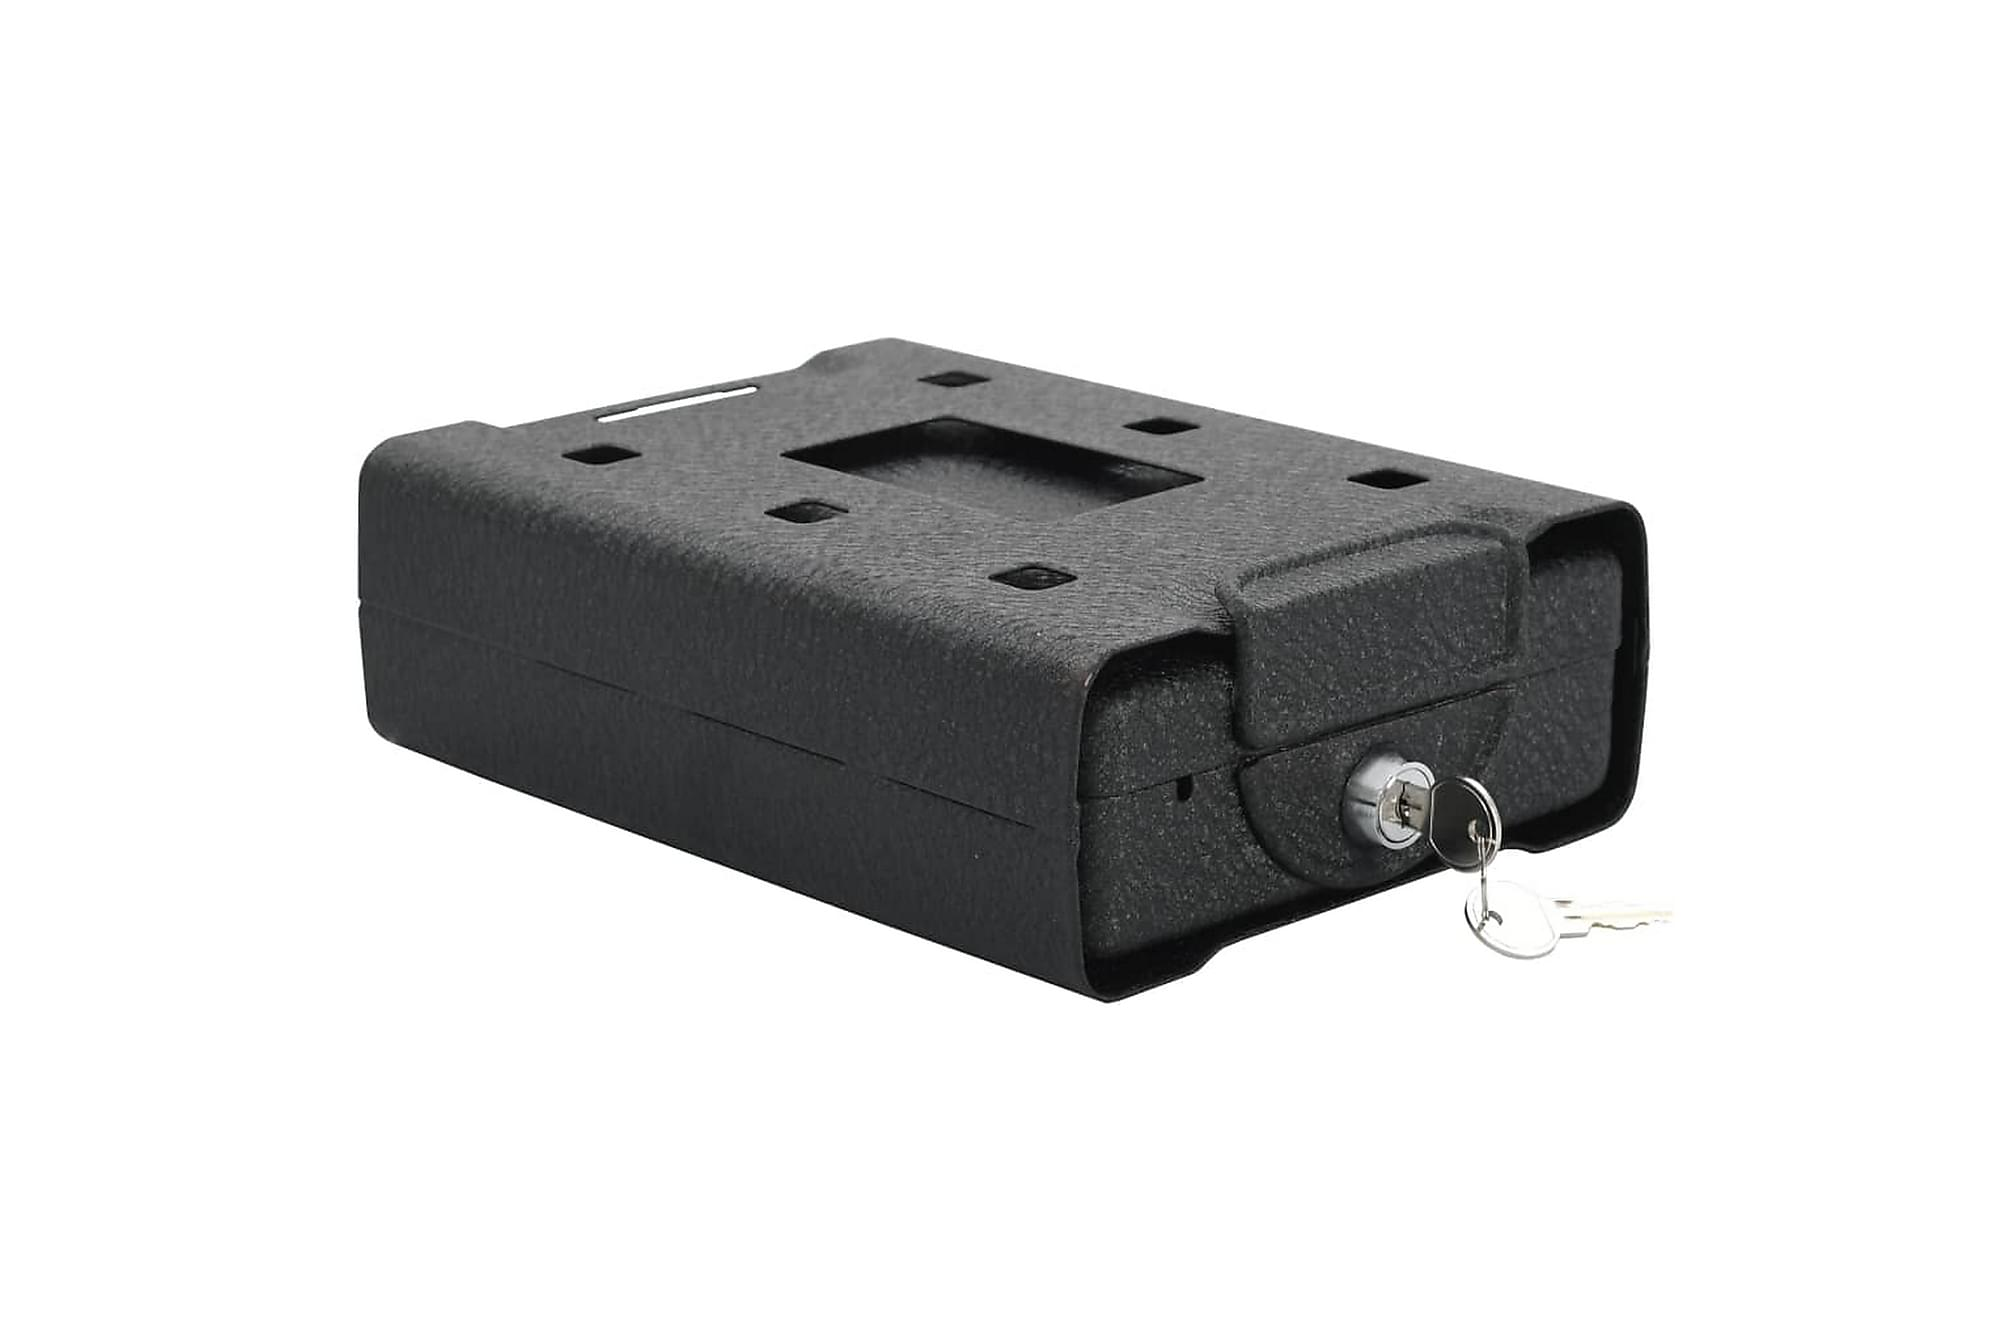 Bilkassaskåp svart 21,8x16x7 cm stål